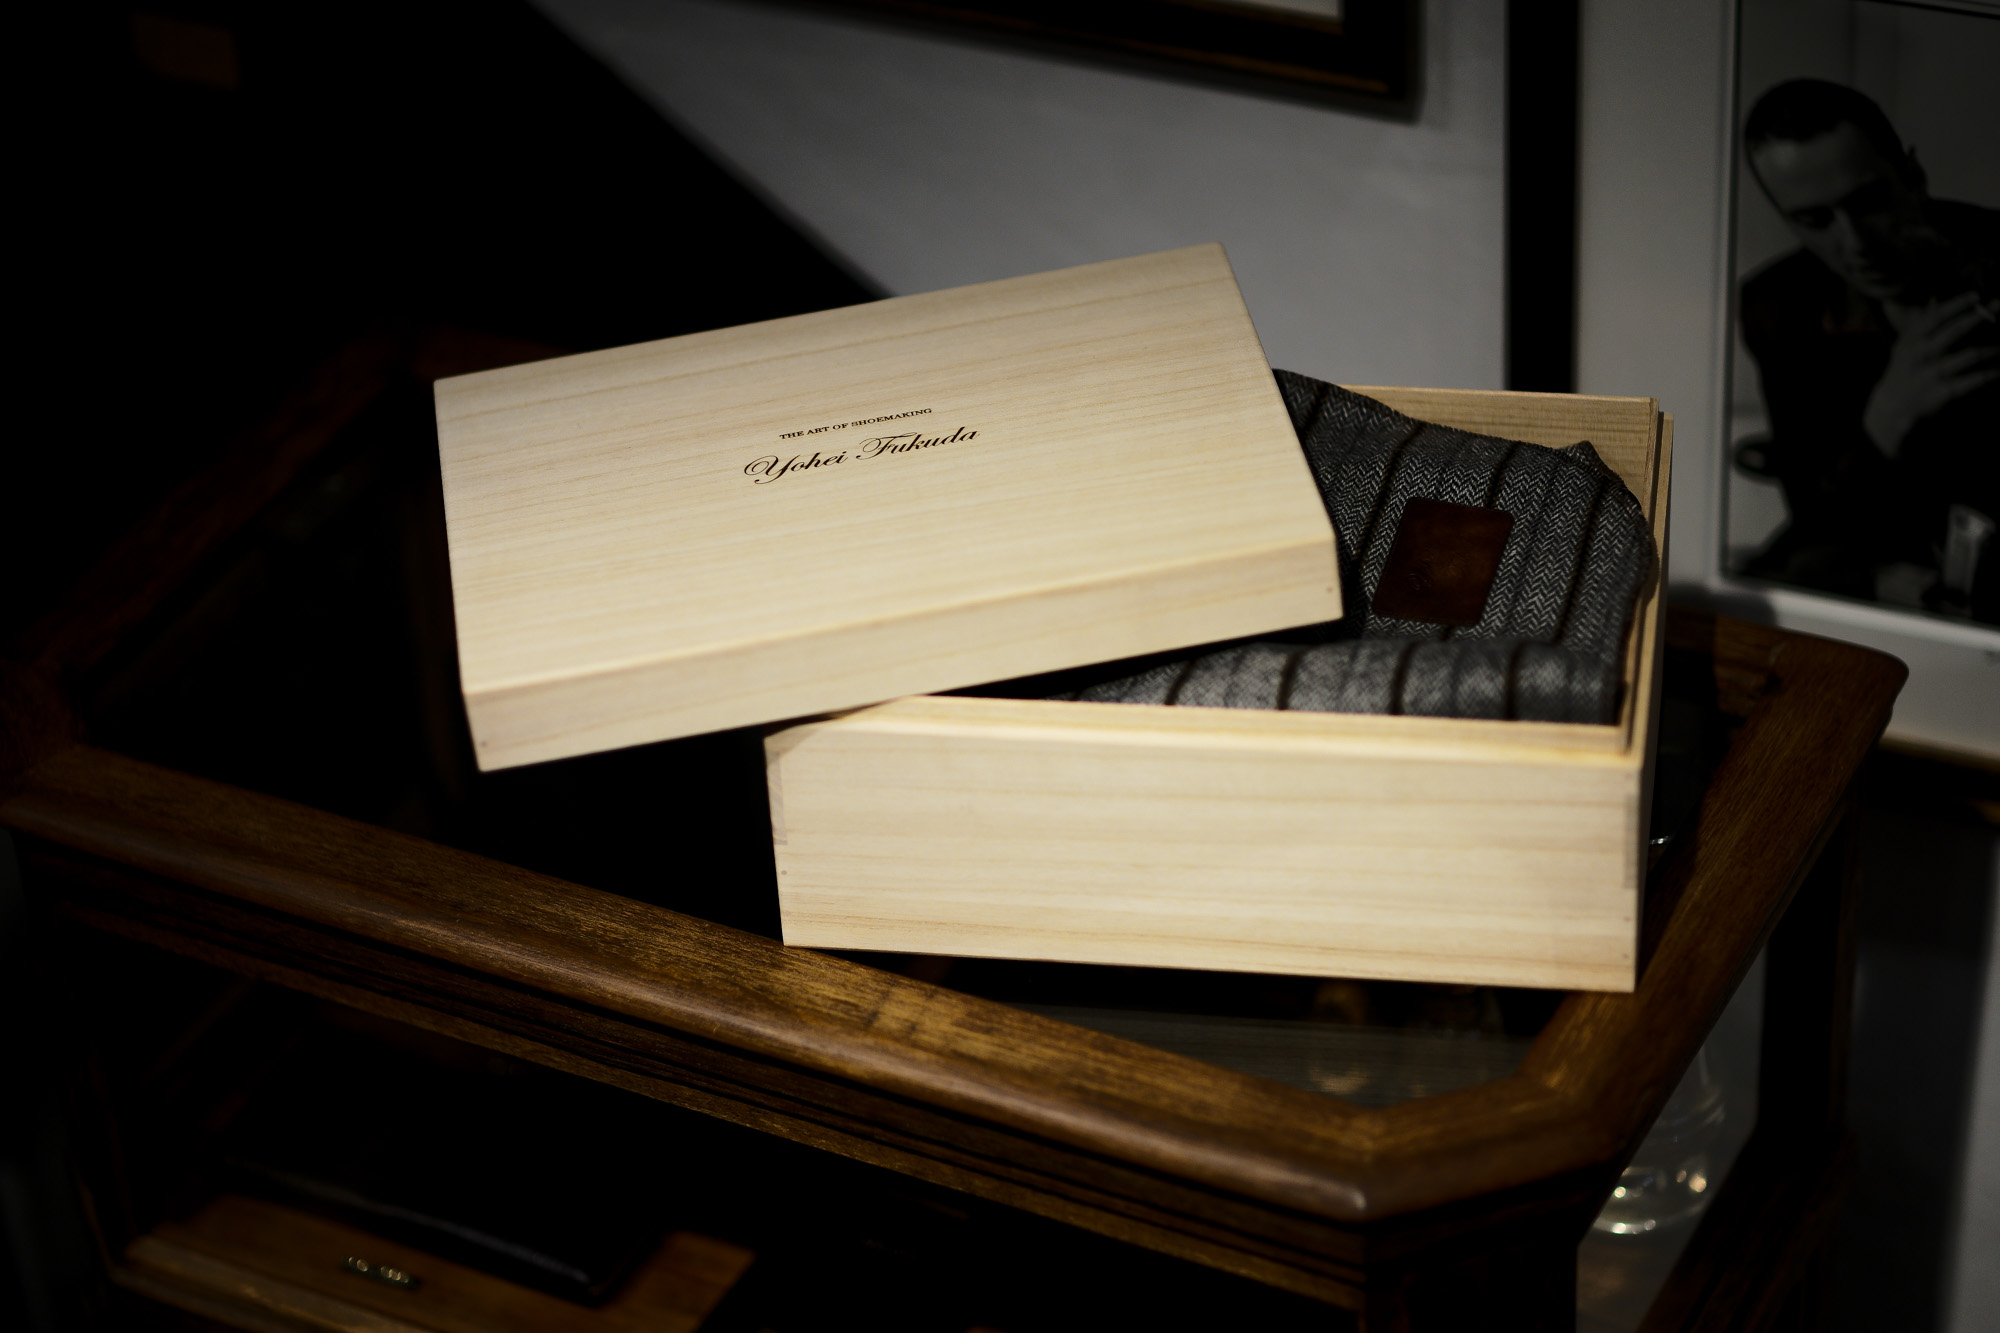 "Yohei Fukuda ""MTO"" Single Monk Strap Shoes Black Suede 2021 ヨウヘイフクダ シングルモンク ストラップシューズ ブラックスエード ドレスシューズ 愛知 名古屋 Alto e Diritto altoediritto アルトエデリット Chisel Toe Half Rubber Rubber Heel"